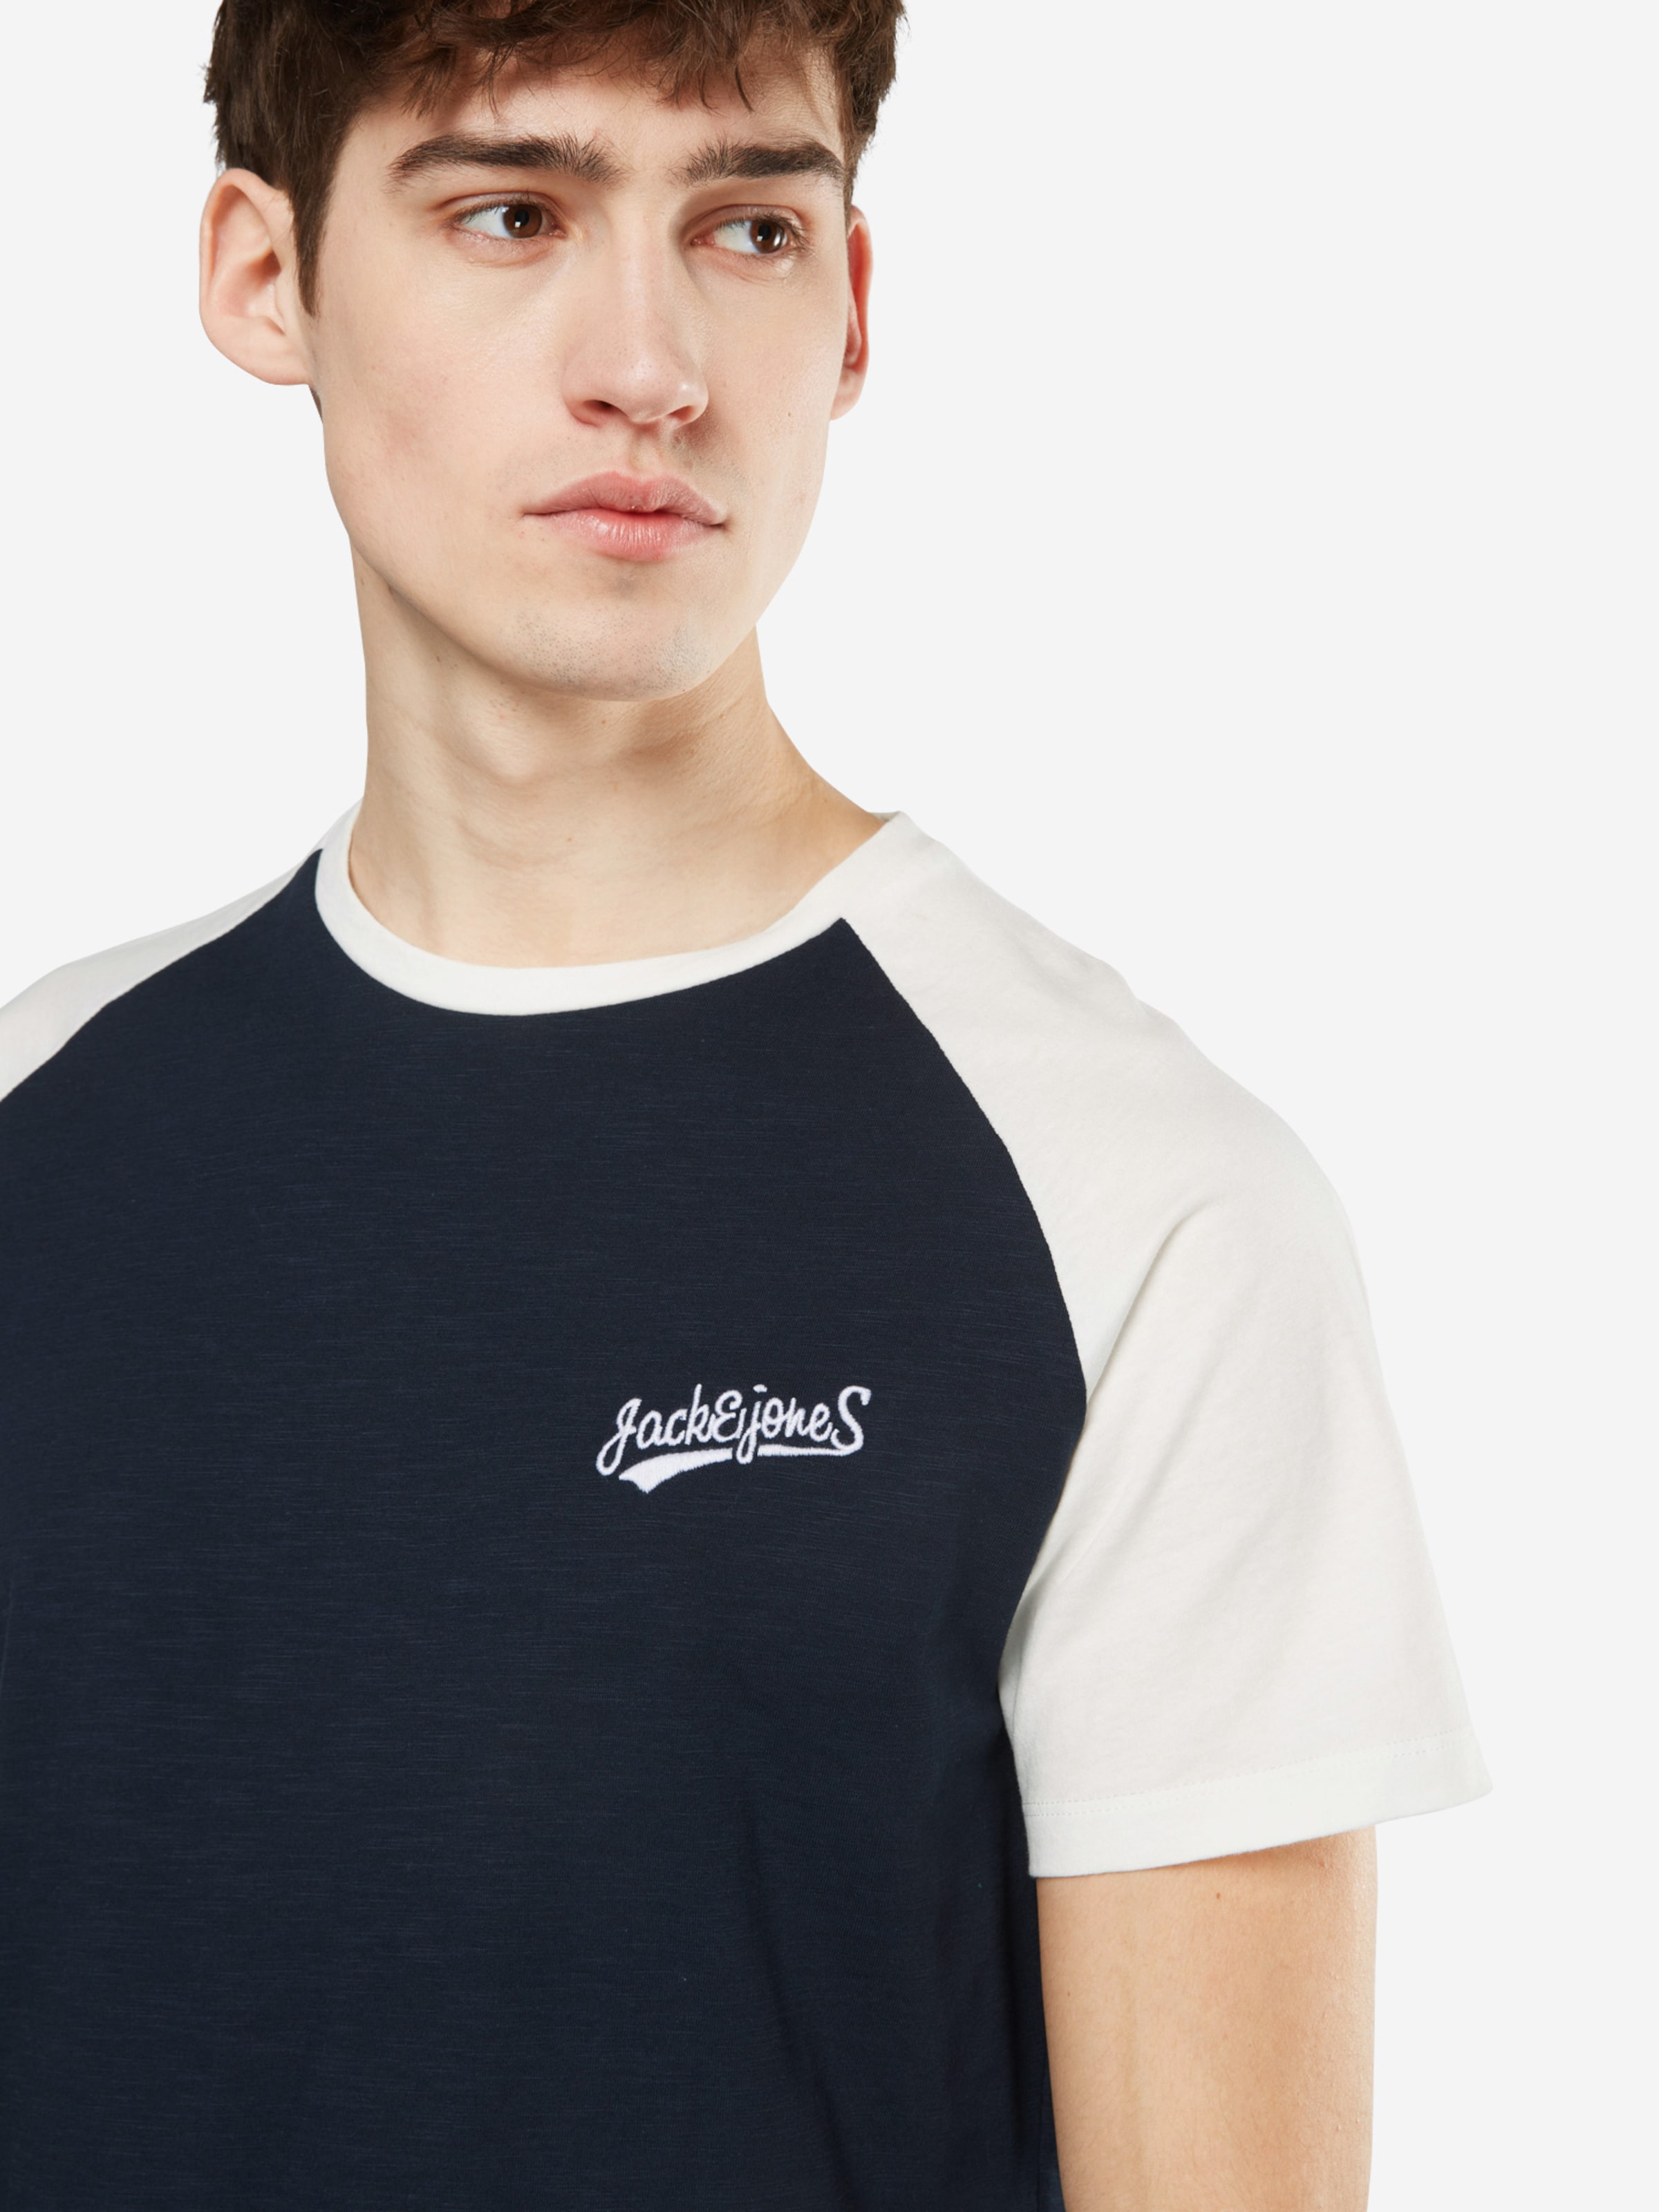 2018 Online-Verkauf JACK & JONES T-Shirt 'JORHOBBS RAGLAN SS CREW NECK' Sast Günstig Online Schlussverkauf Geniue Händler Günstig Online 5AMEu4oPfn